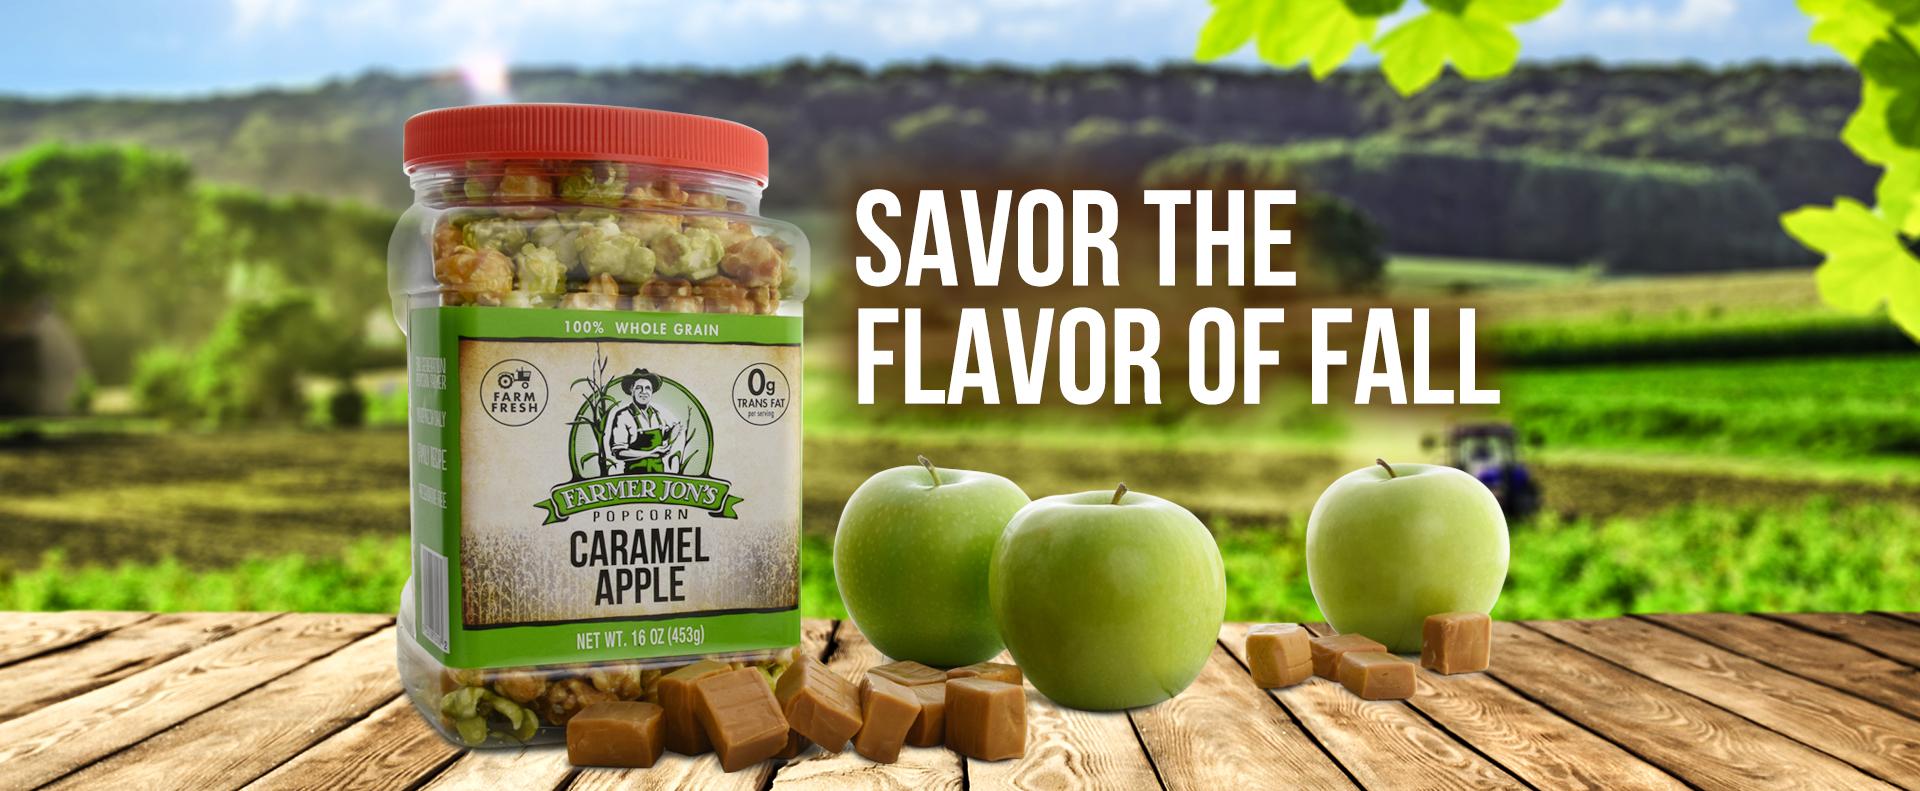 Savor The Flavor of Caramel Apple Popcorn